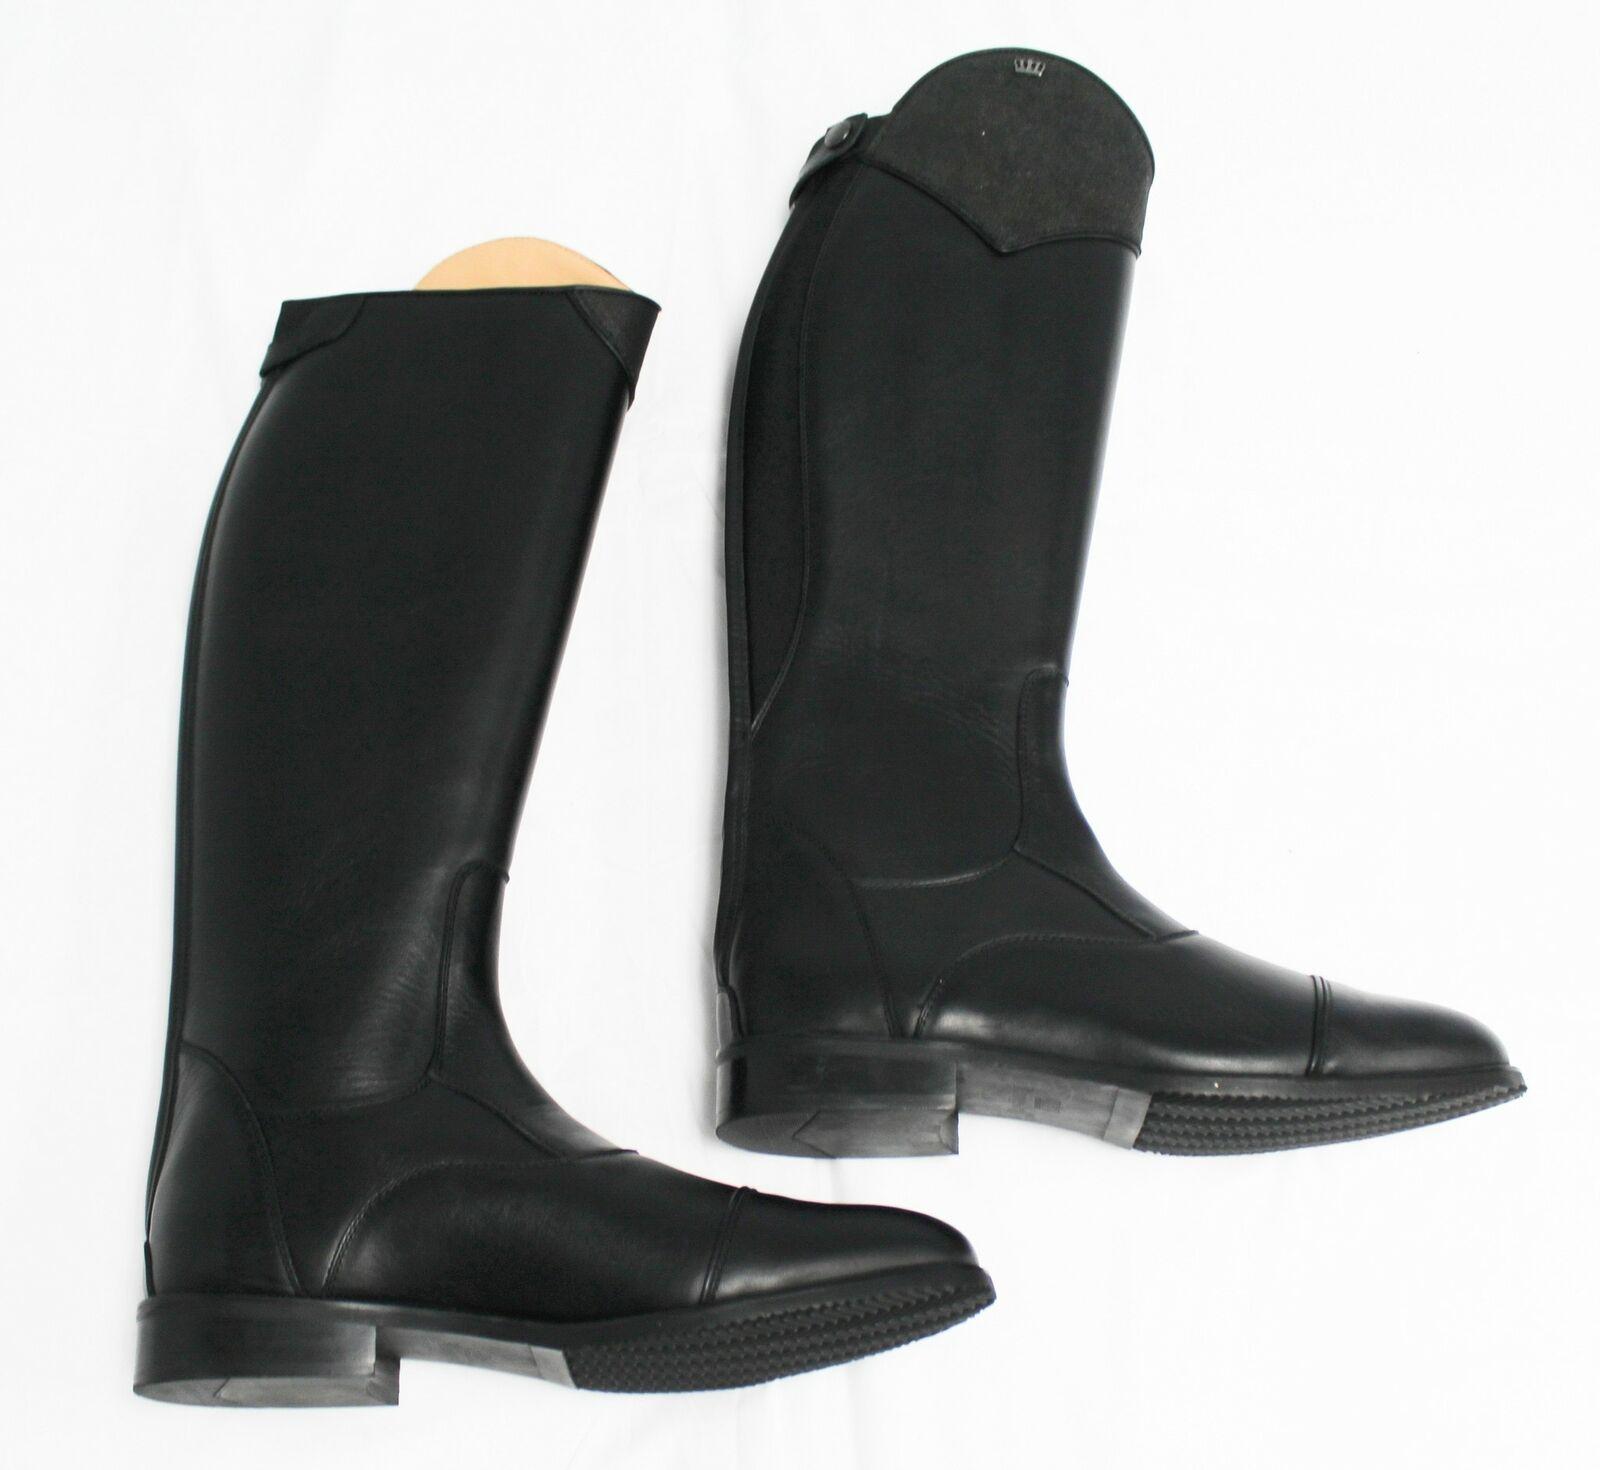 Kingsley Women's Zip-Up Aspen Special Tall Dress Boots BF5 Black Size 44